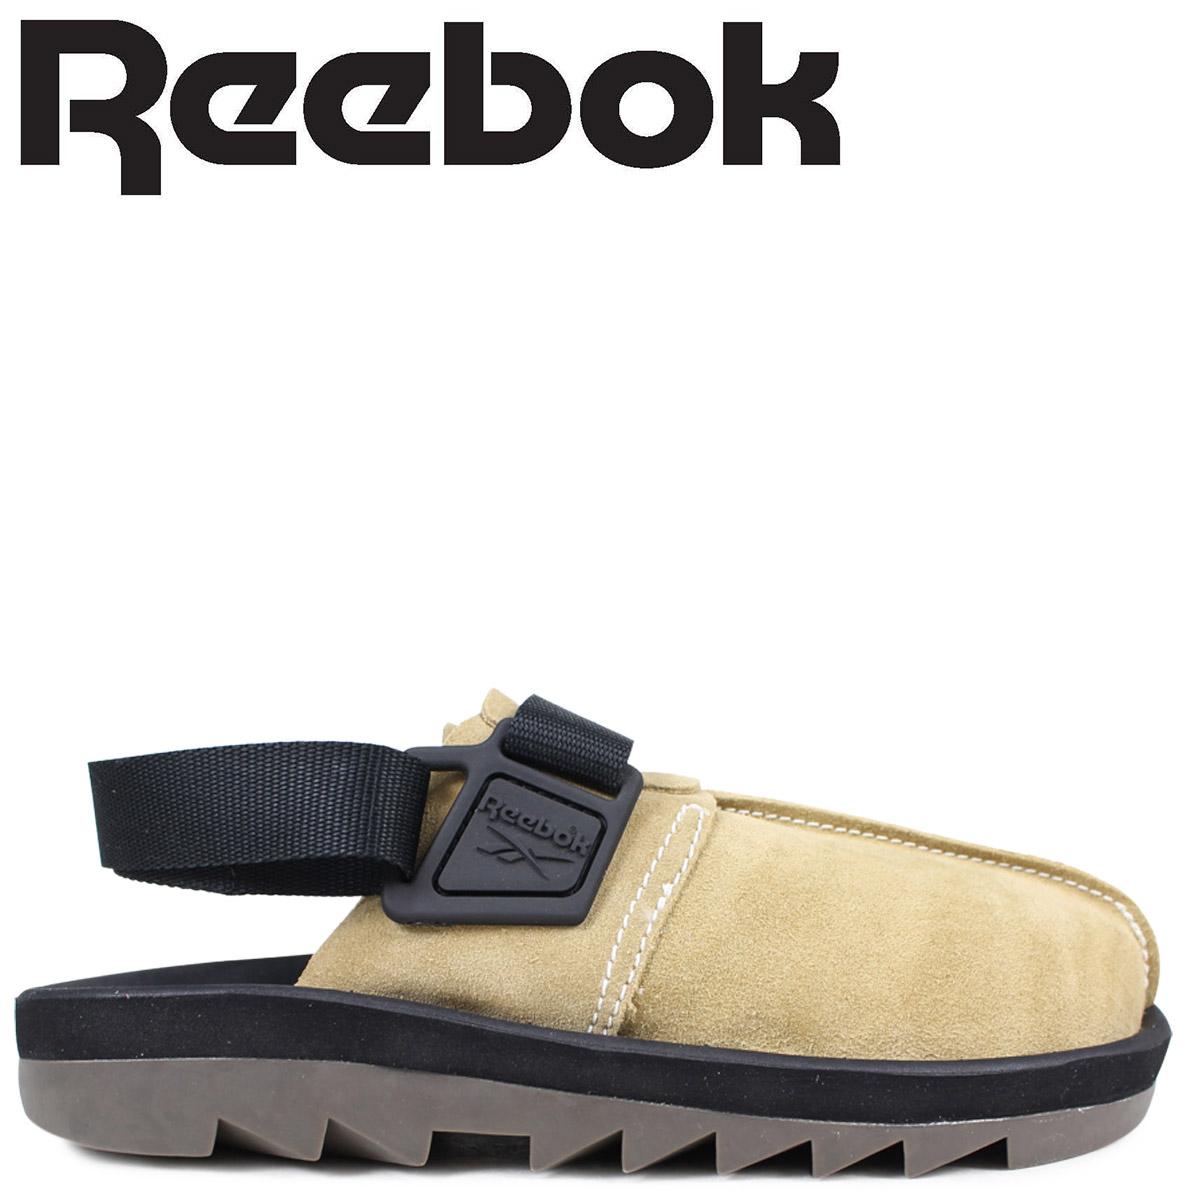 6b3e947c37 Sugar Online Shop  Reebok beat Nic Lady s men sandals Reebok BEATNIK CN3731  brown  3 16 Shinnyu load